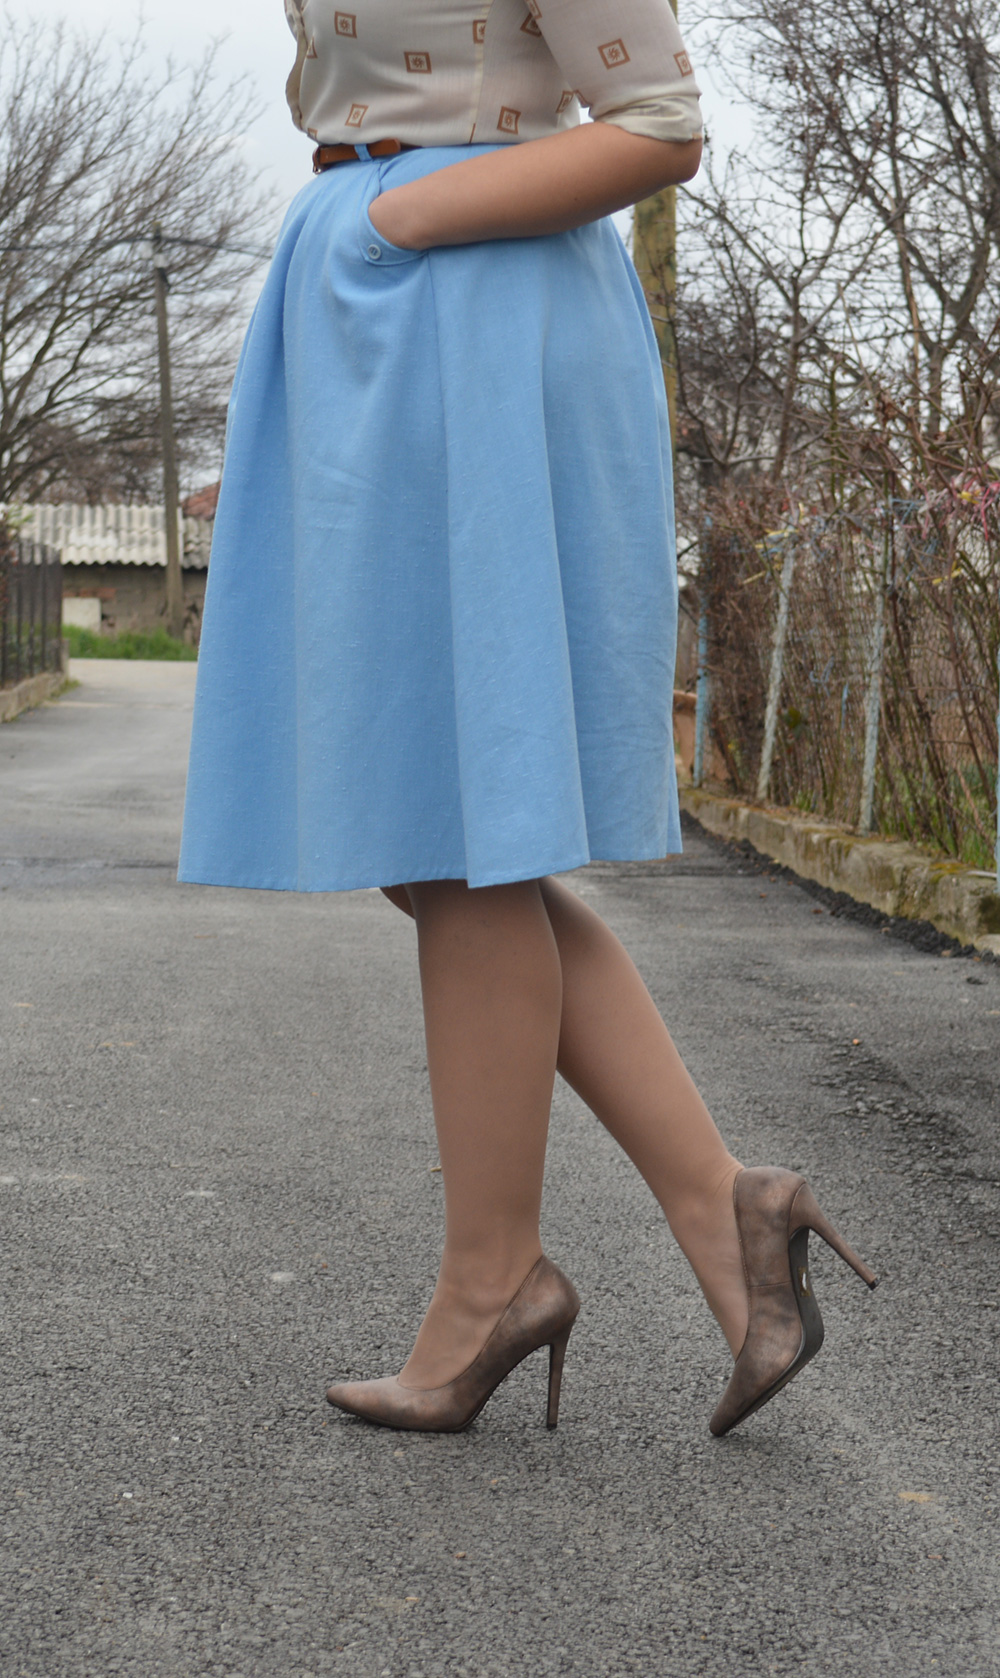 baby blue skirt nylons pics